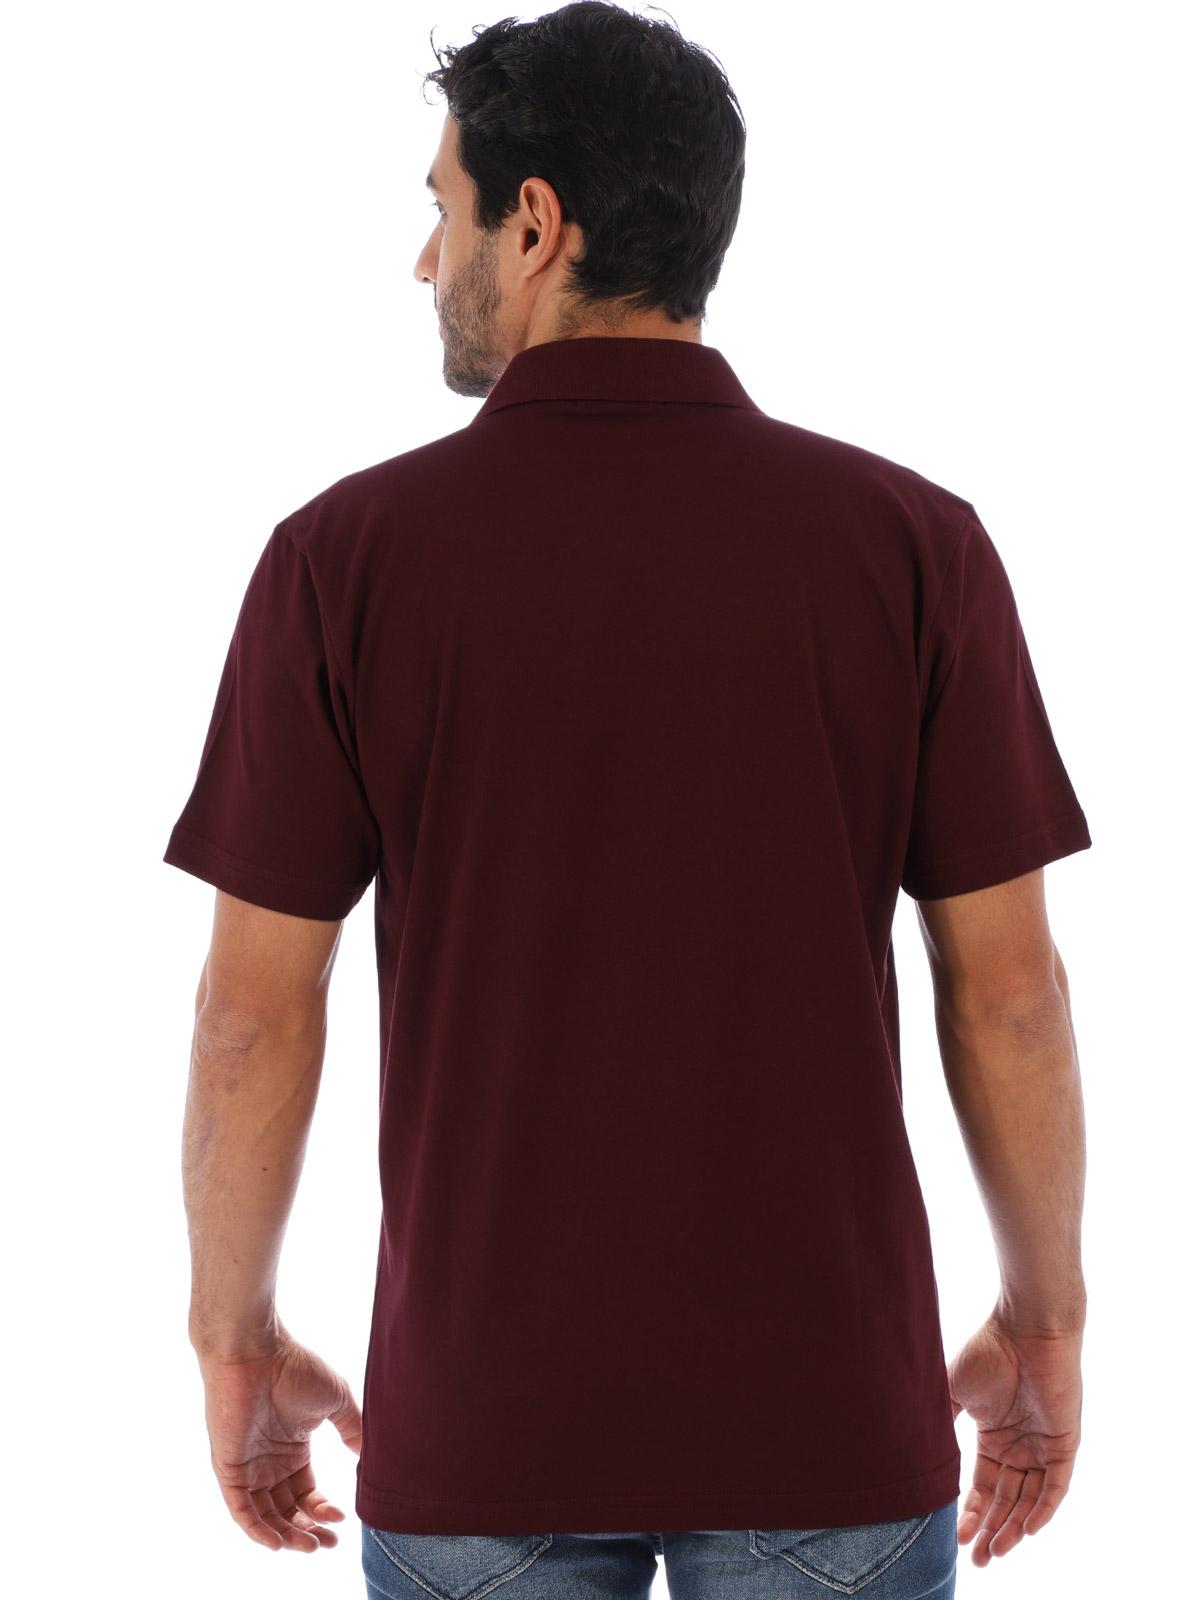 Camisa Polo Masculina Básica Algodão Lisa Conforto Vinho